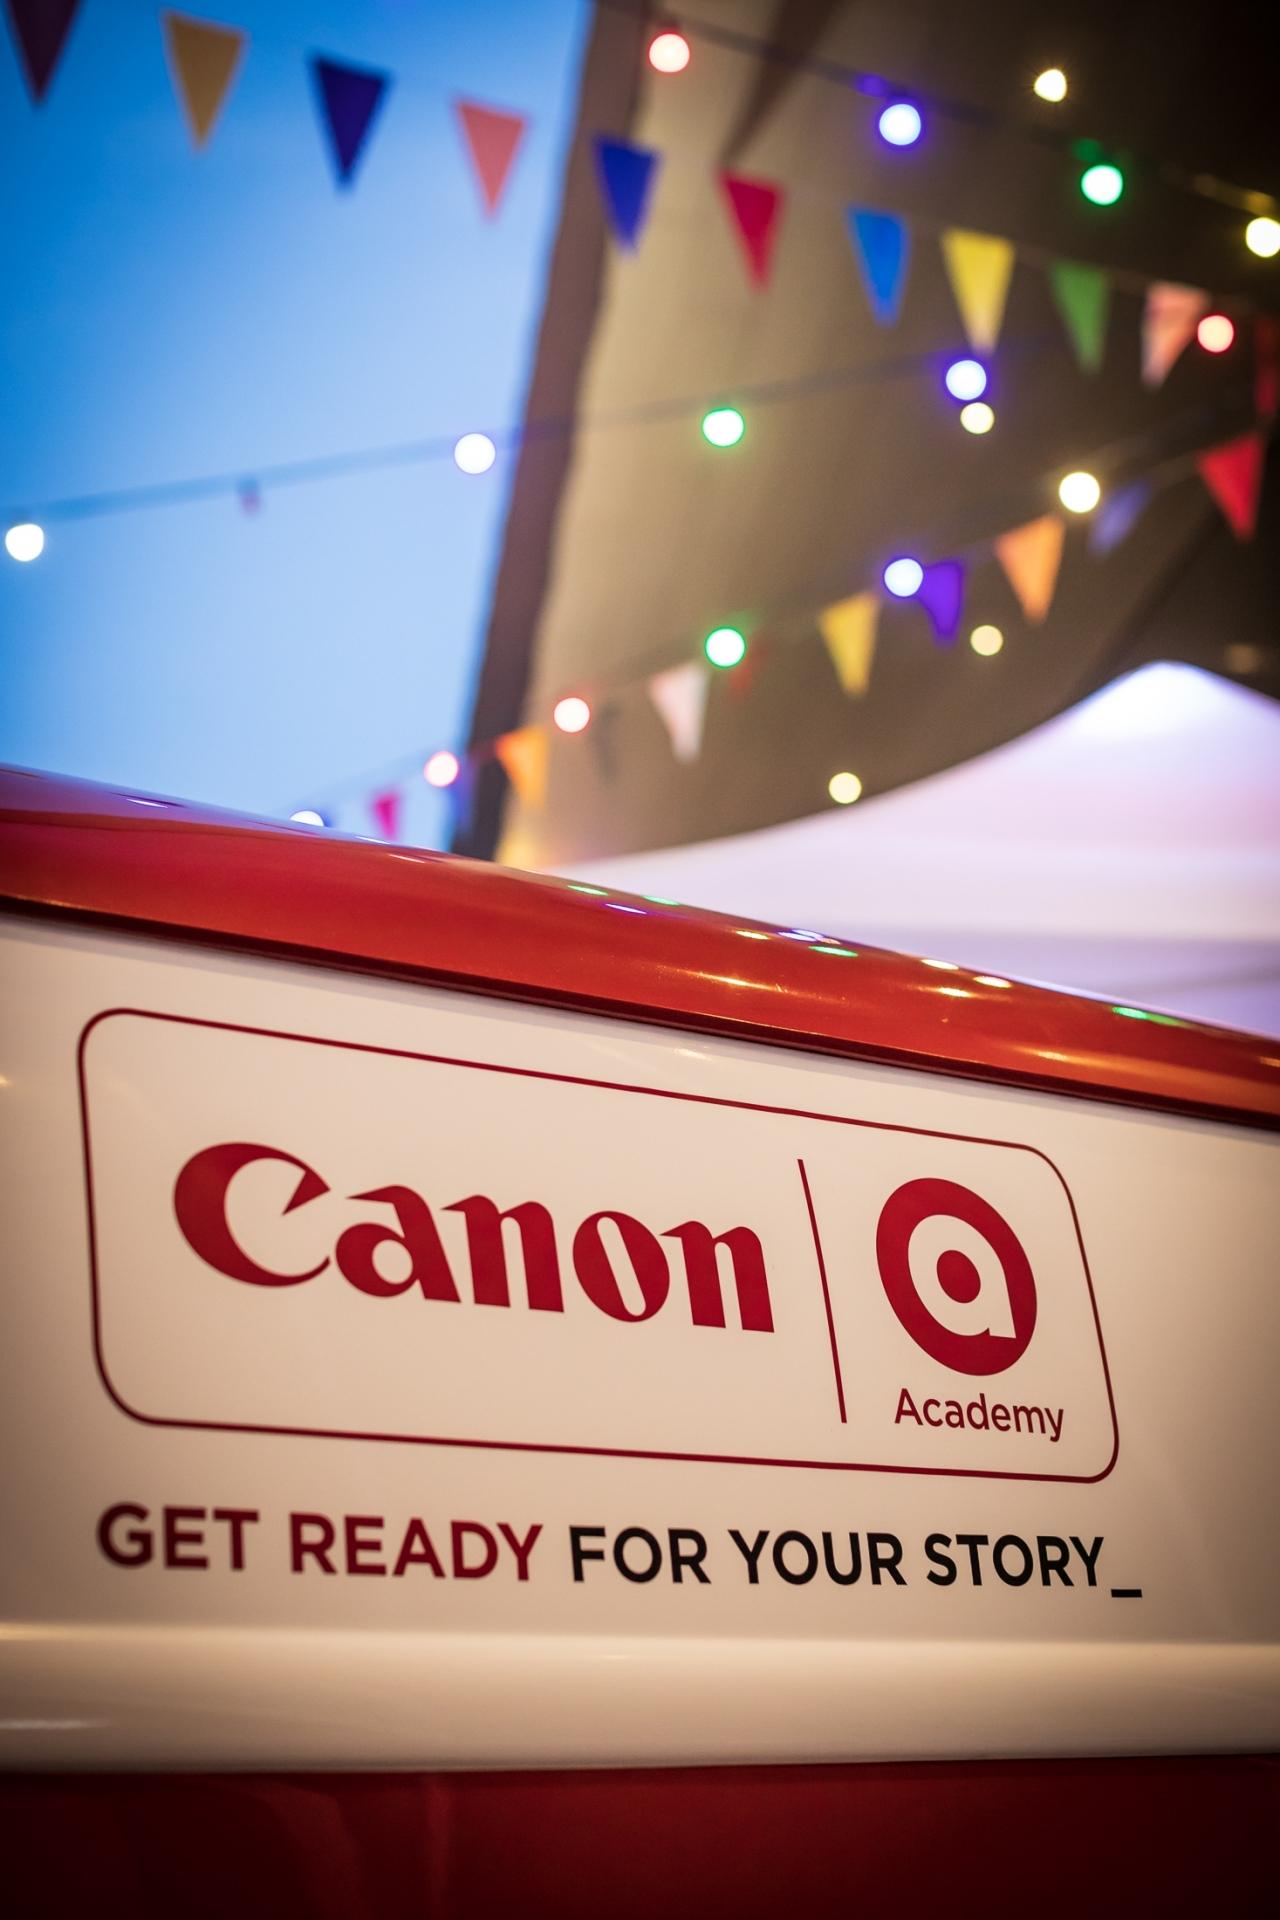 Canon Academy beim Streetfood Festival Basel - Canon Academy Spezialthemen